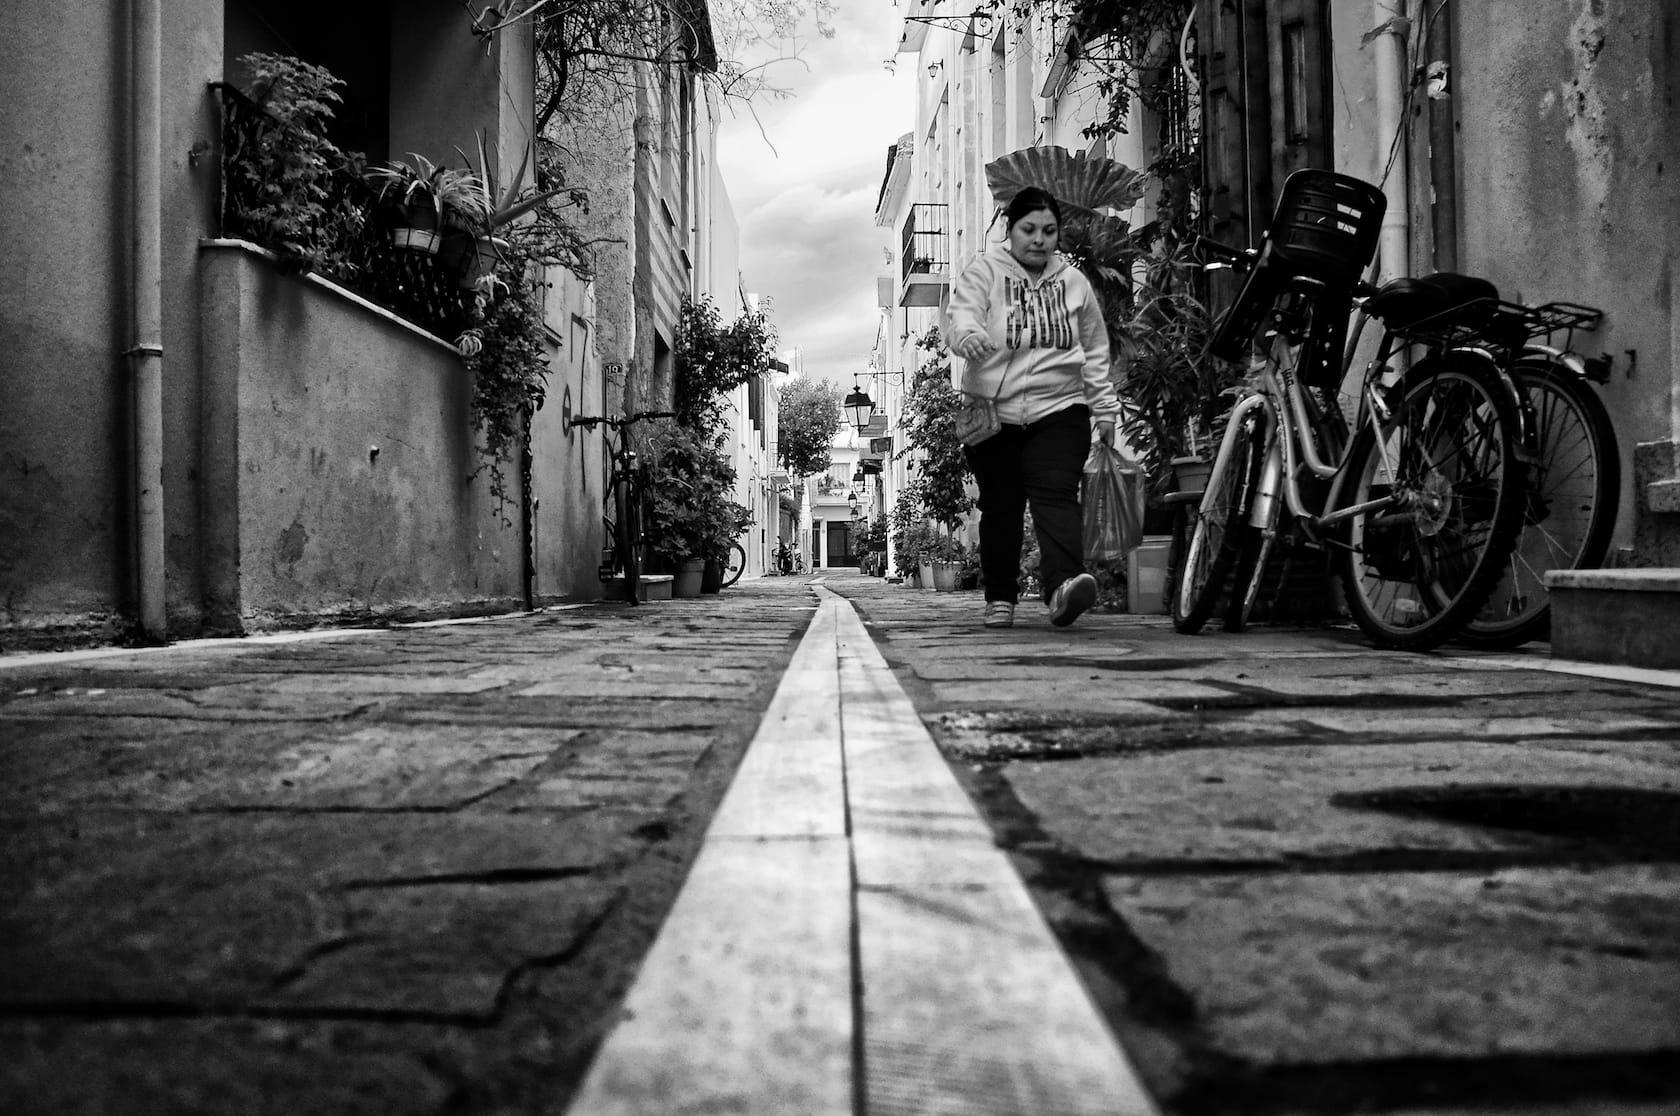 """alone in the alley"" by Spyros Papaspyropoulos"